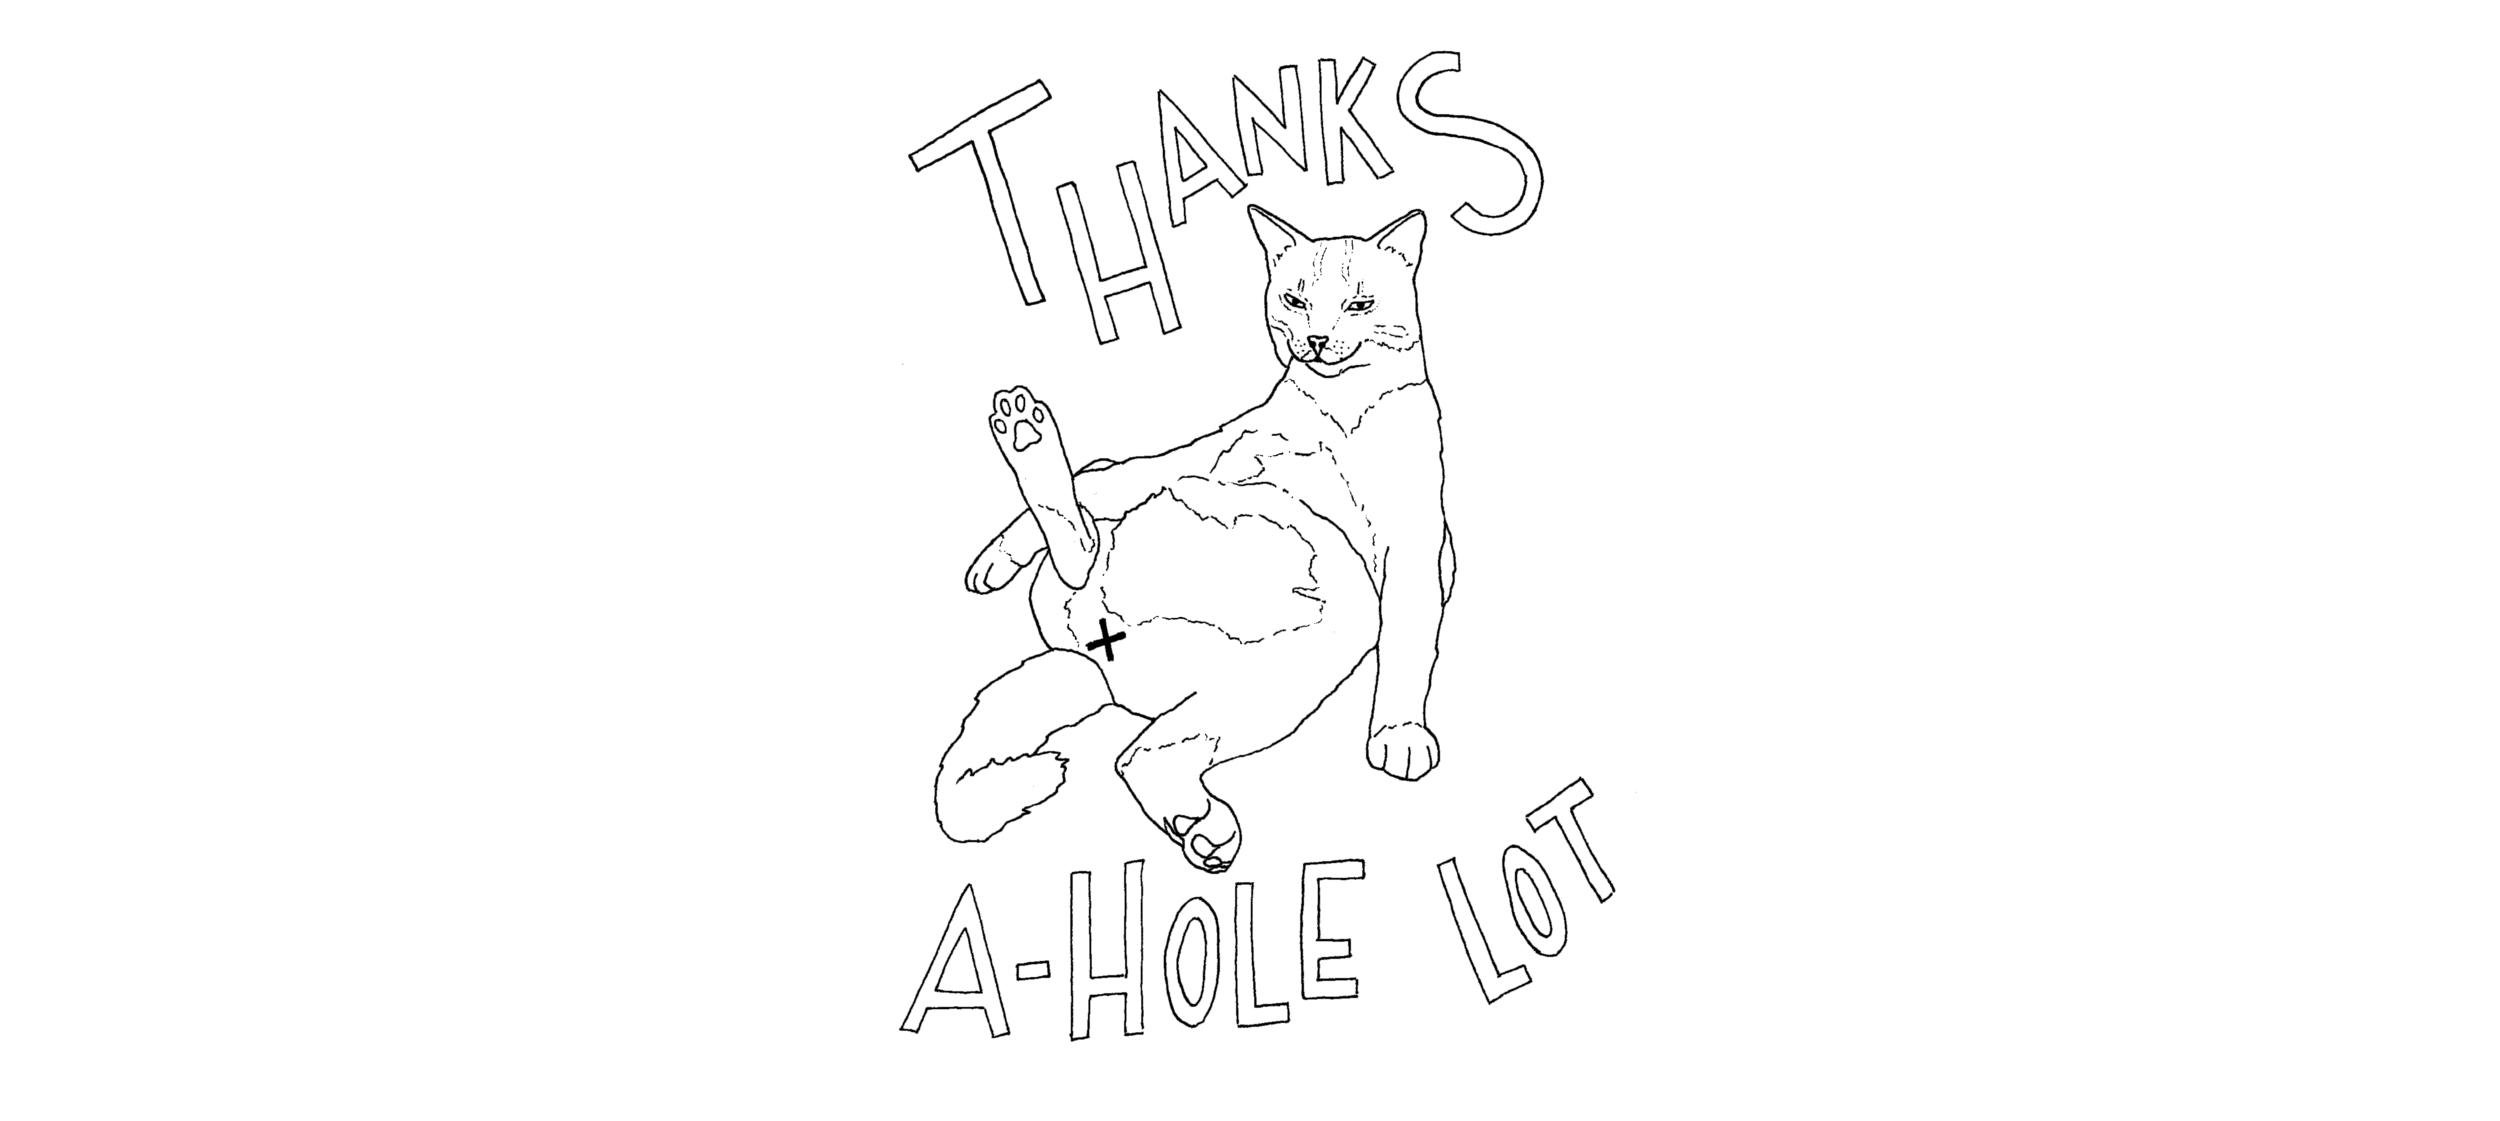 Cat_A.Hole_Card_(Jim)-small.jpg